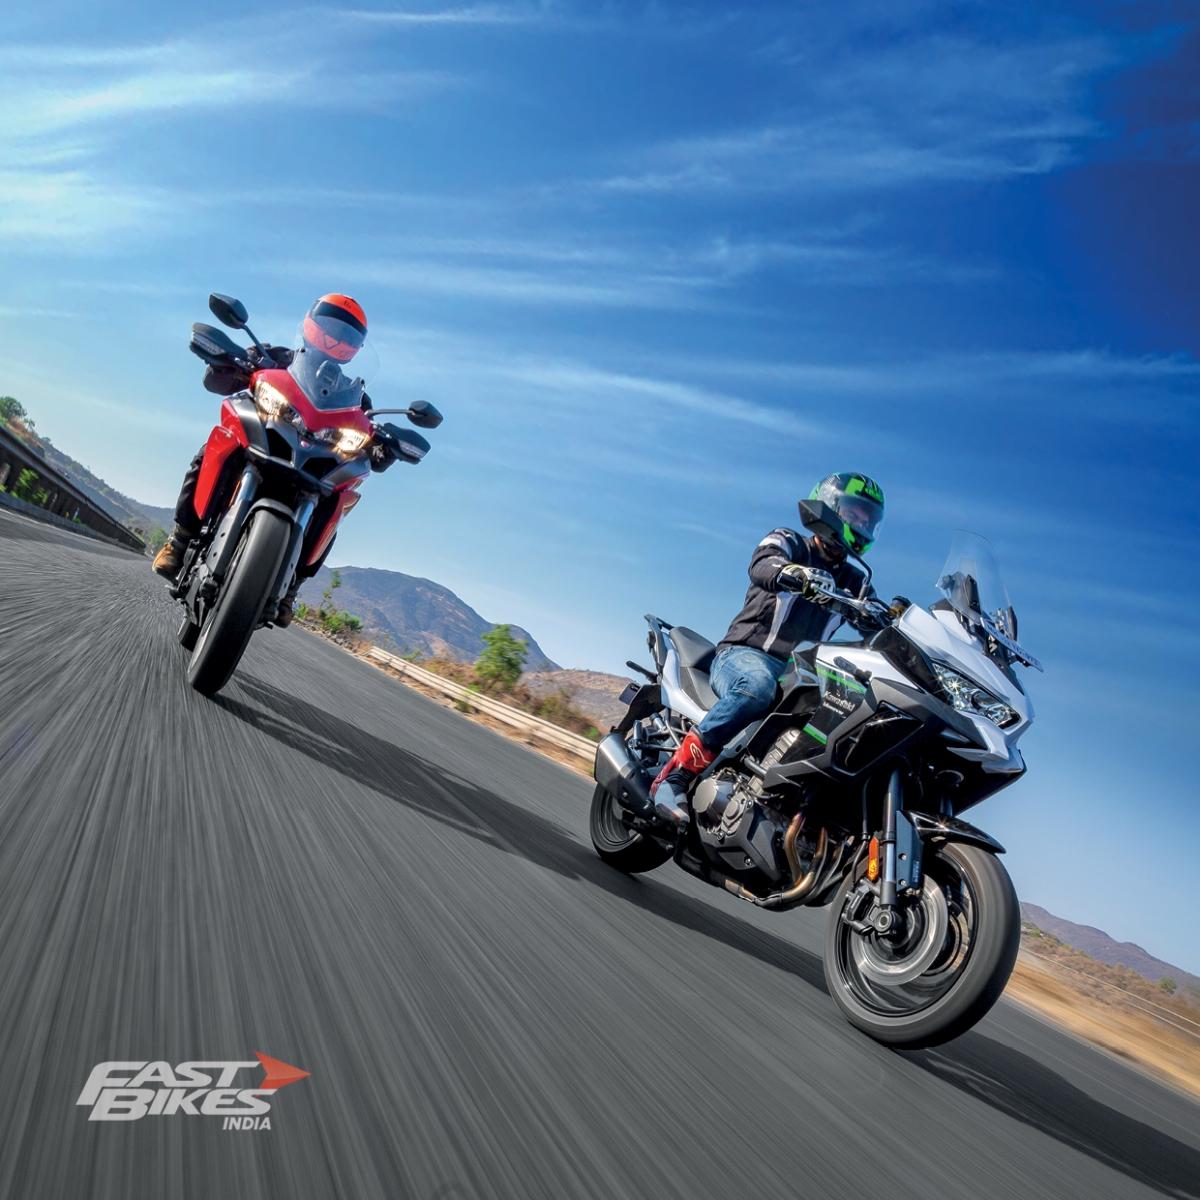 Tourer shootout – Ducati Multistrada 950 vs Kawasaki Versys 1000